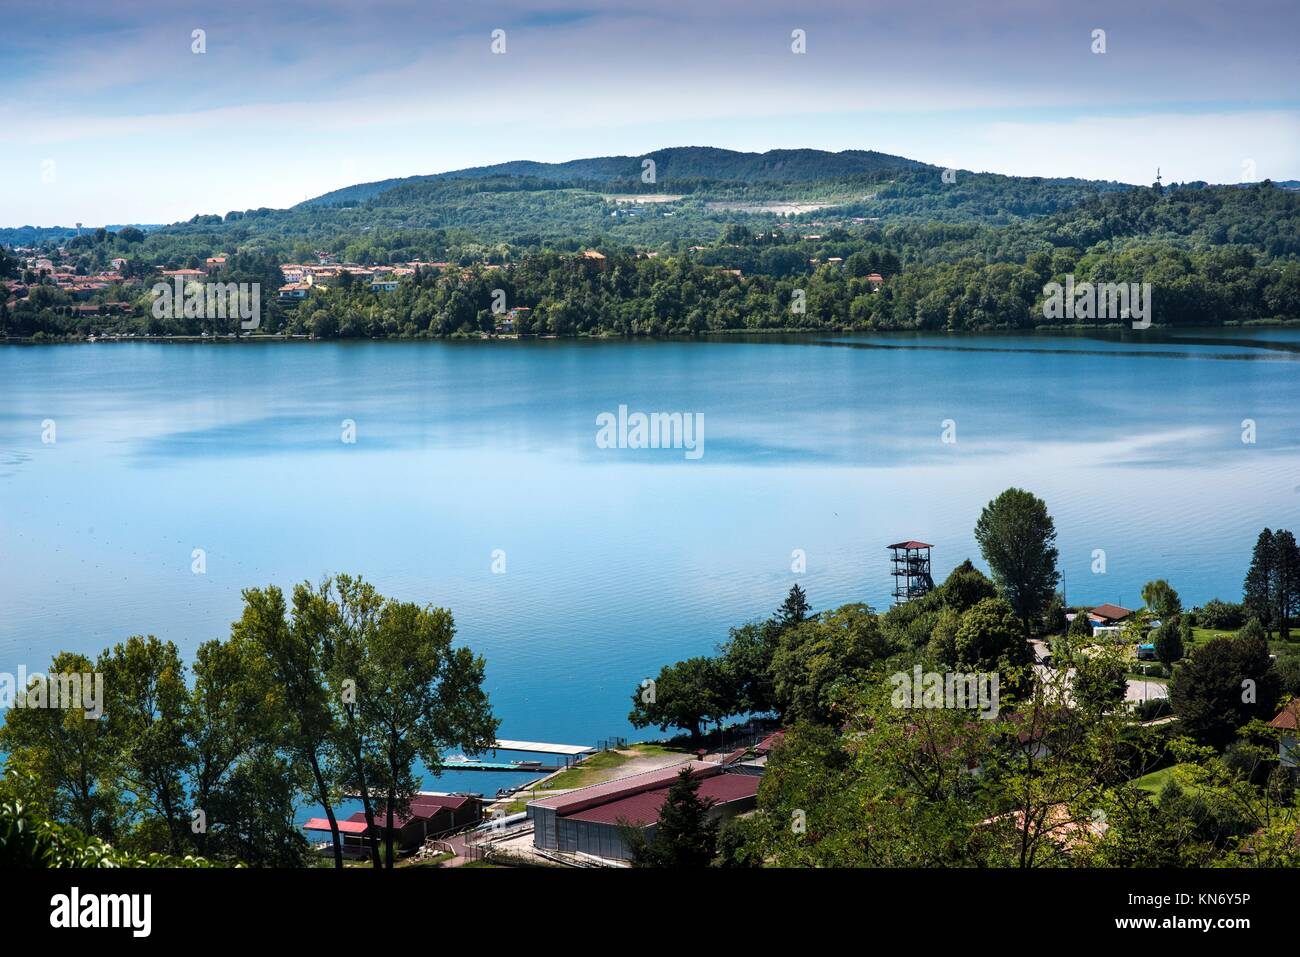 Varese Italien lago di varese stockfotos lago di varese bilder alamy